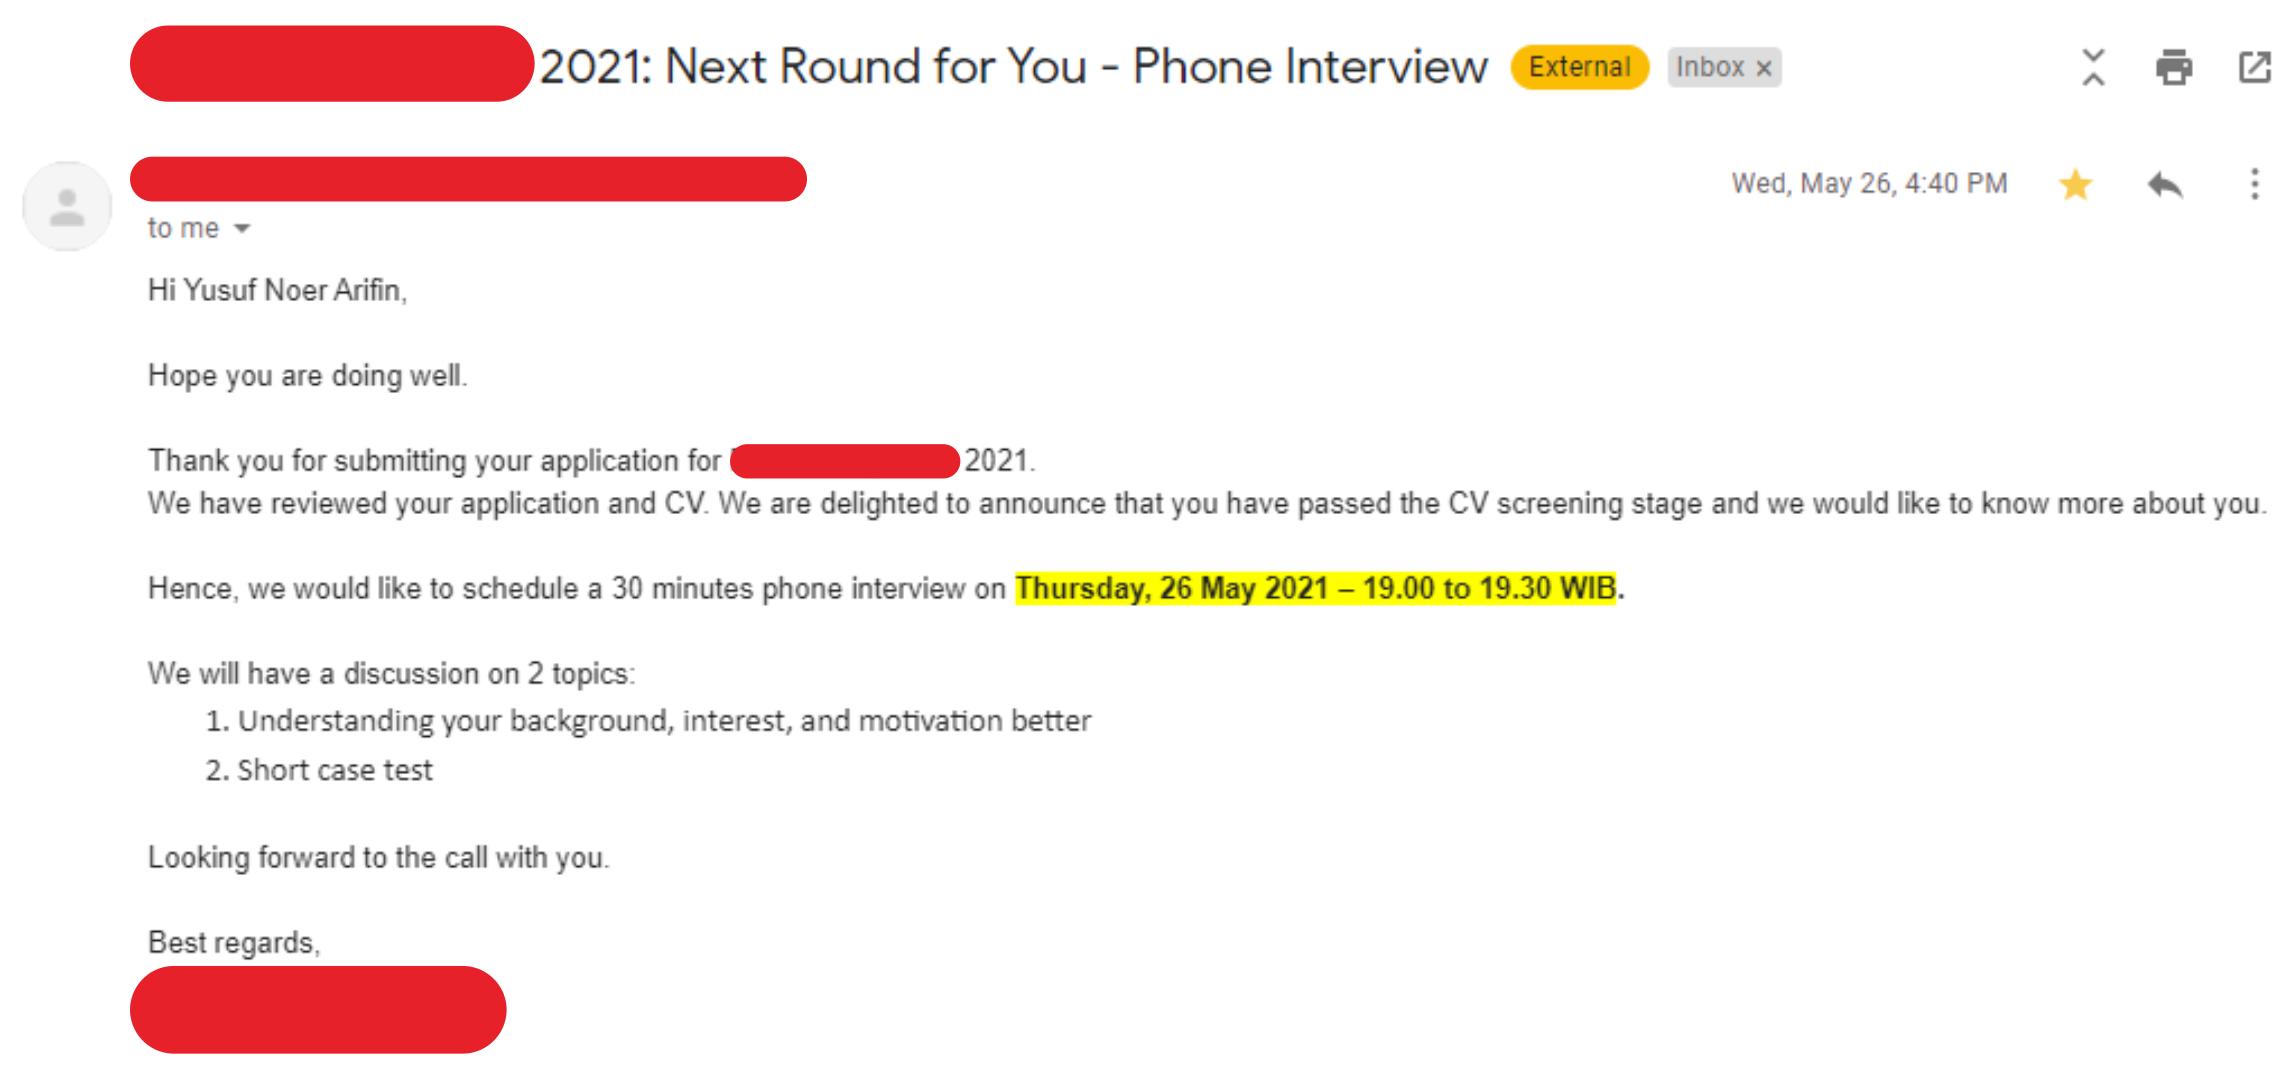 Undangan experience interview dan case interview di salah satu perusahaan MBB (McKinsey, BCG, Bain)